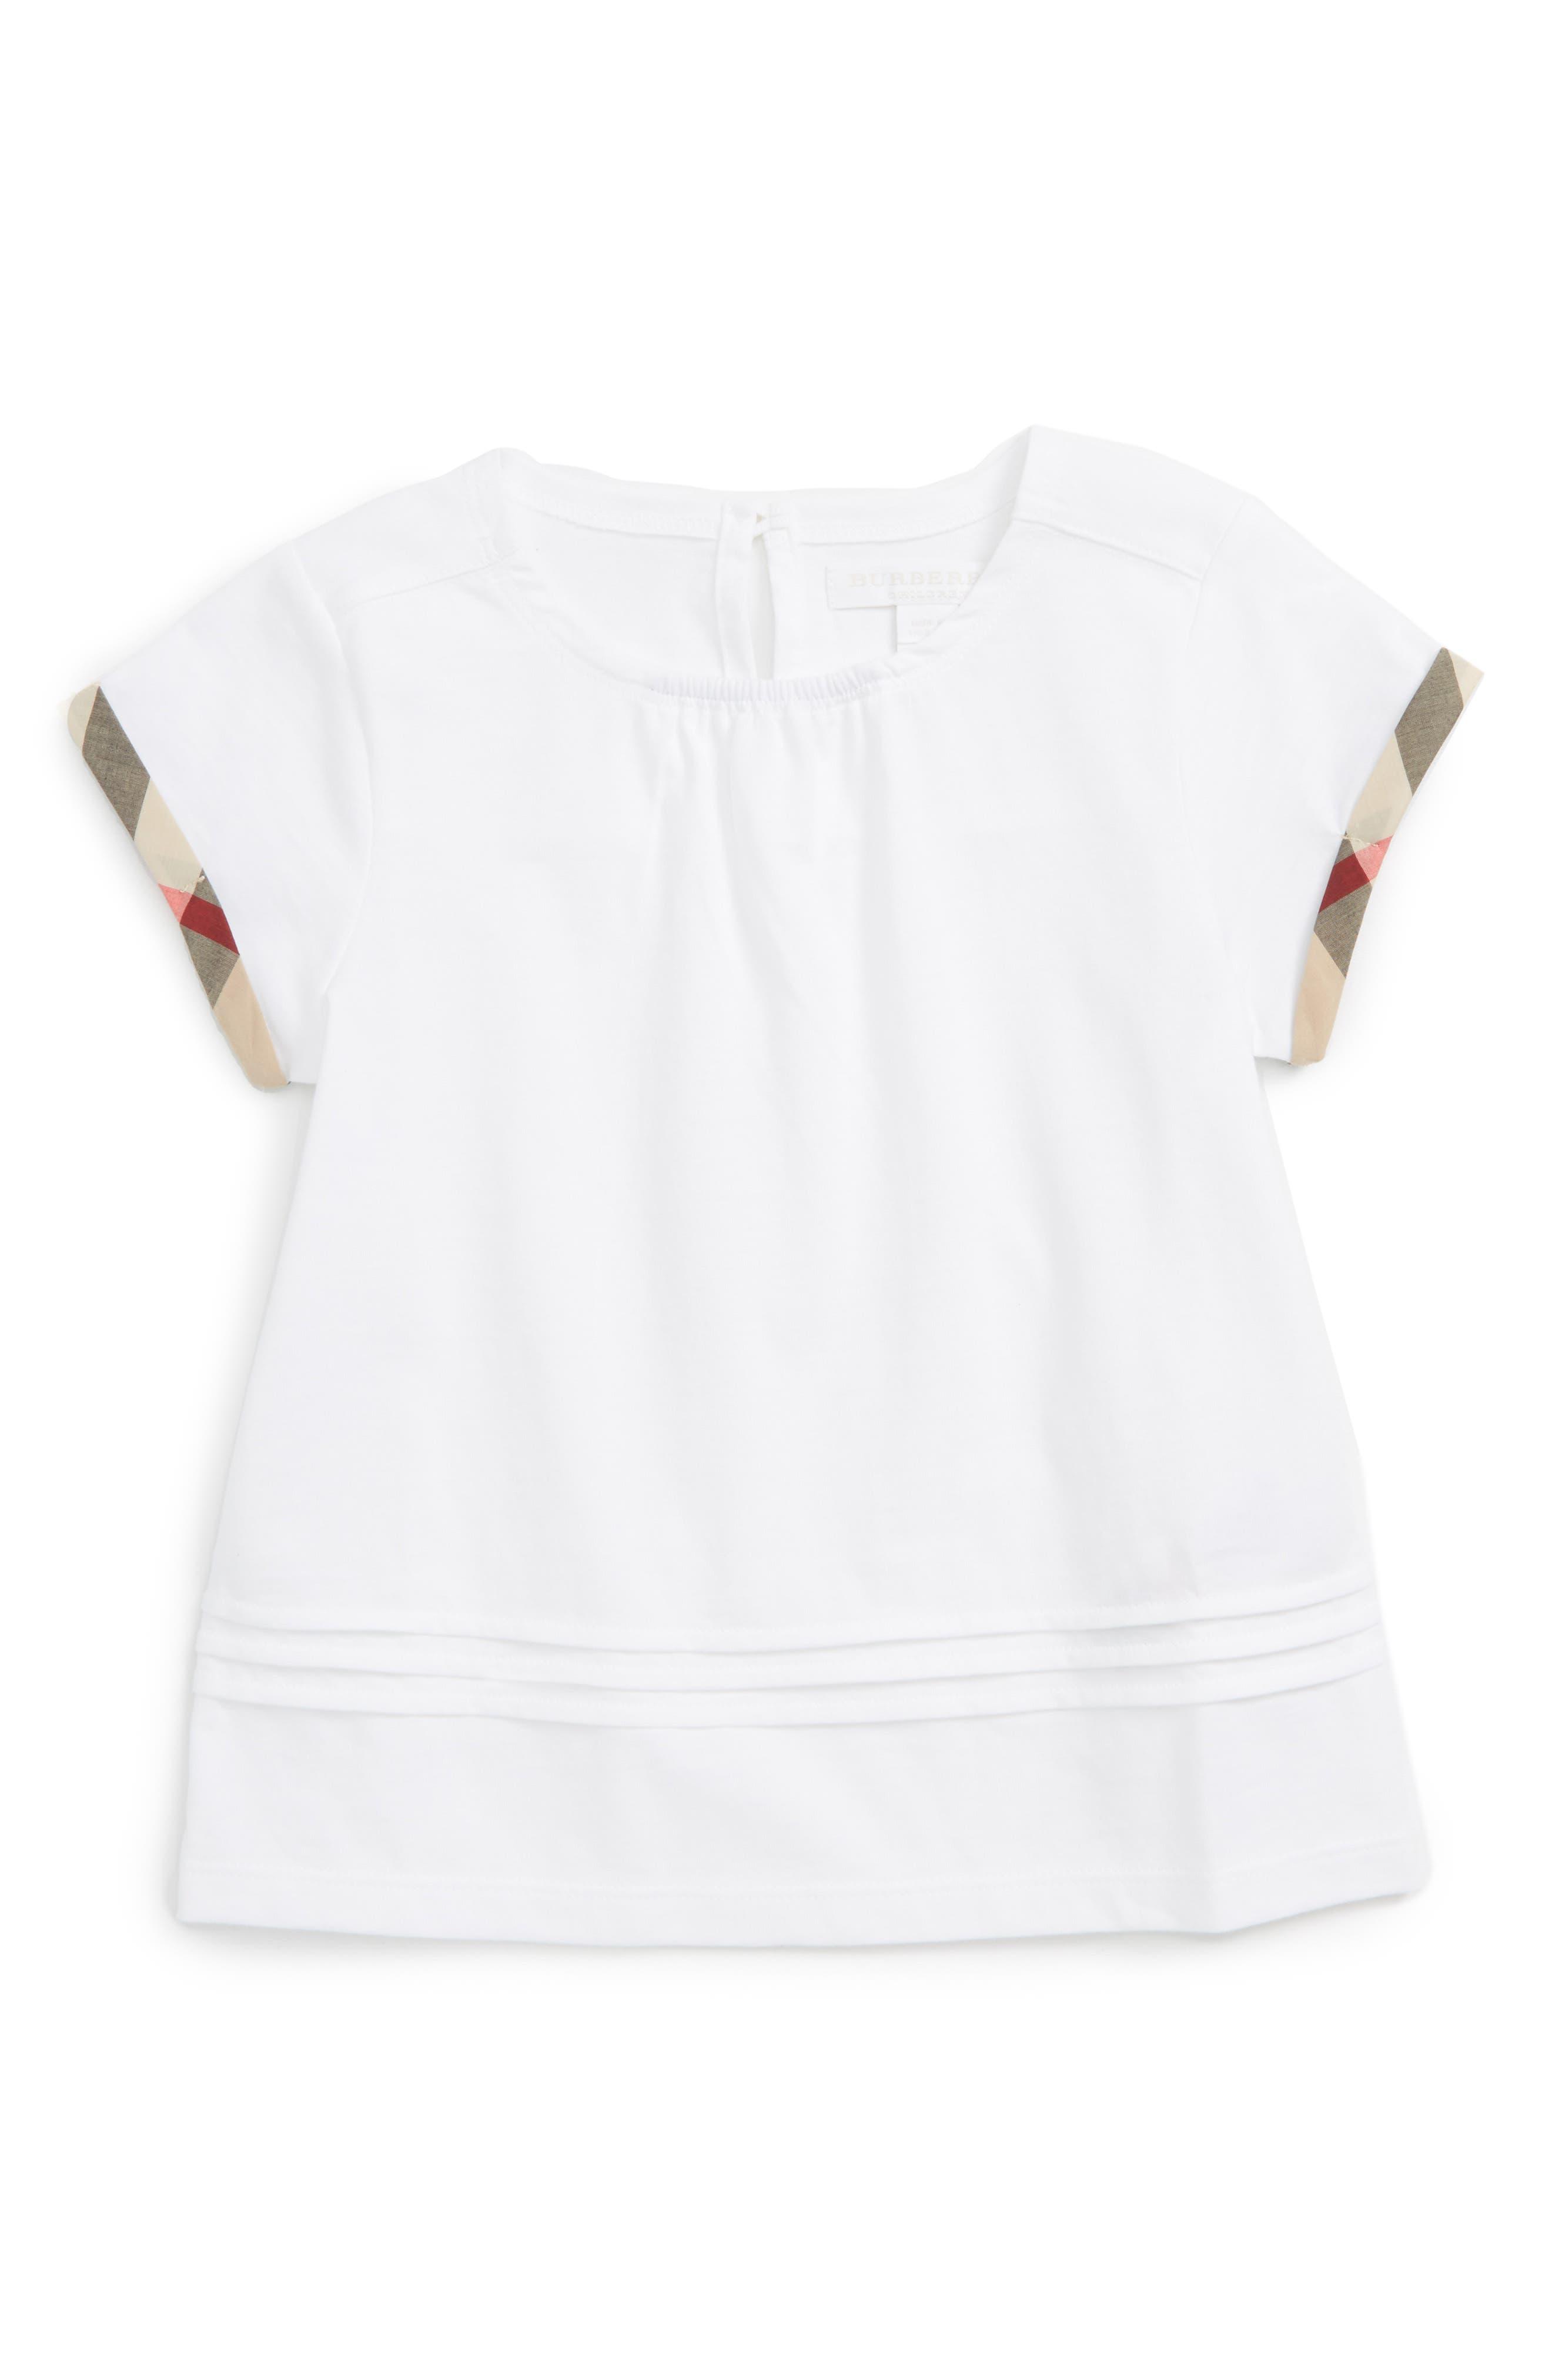 Gisselle Shirt,                         Main,                         color, White